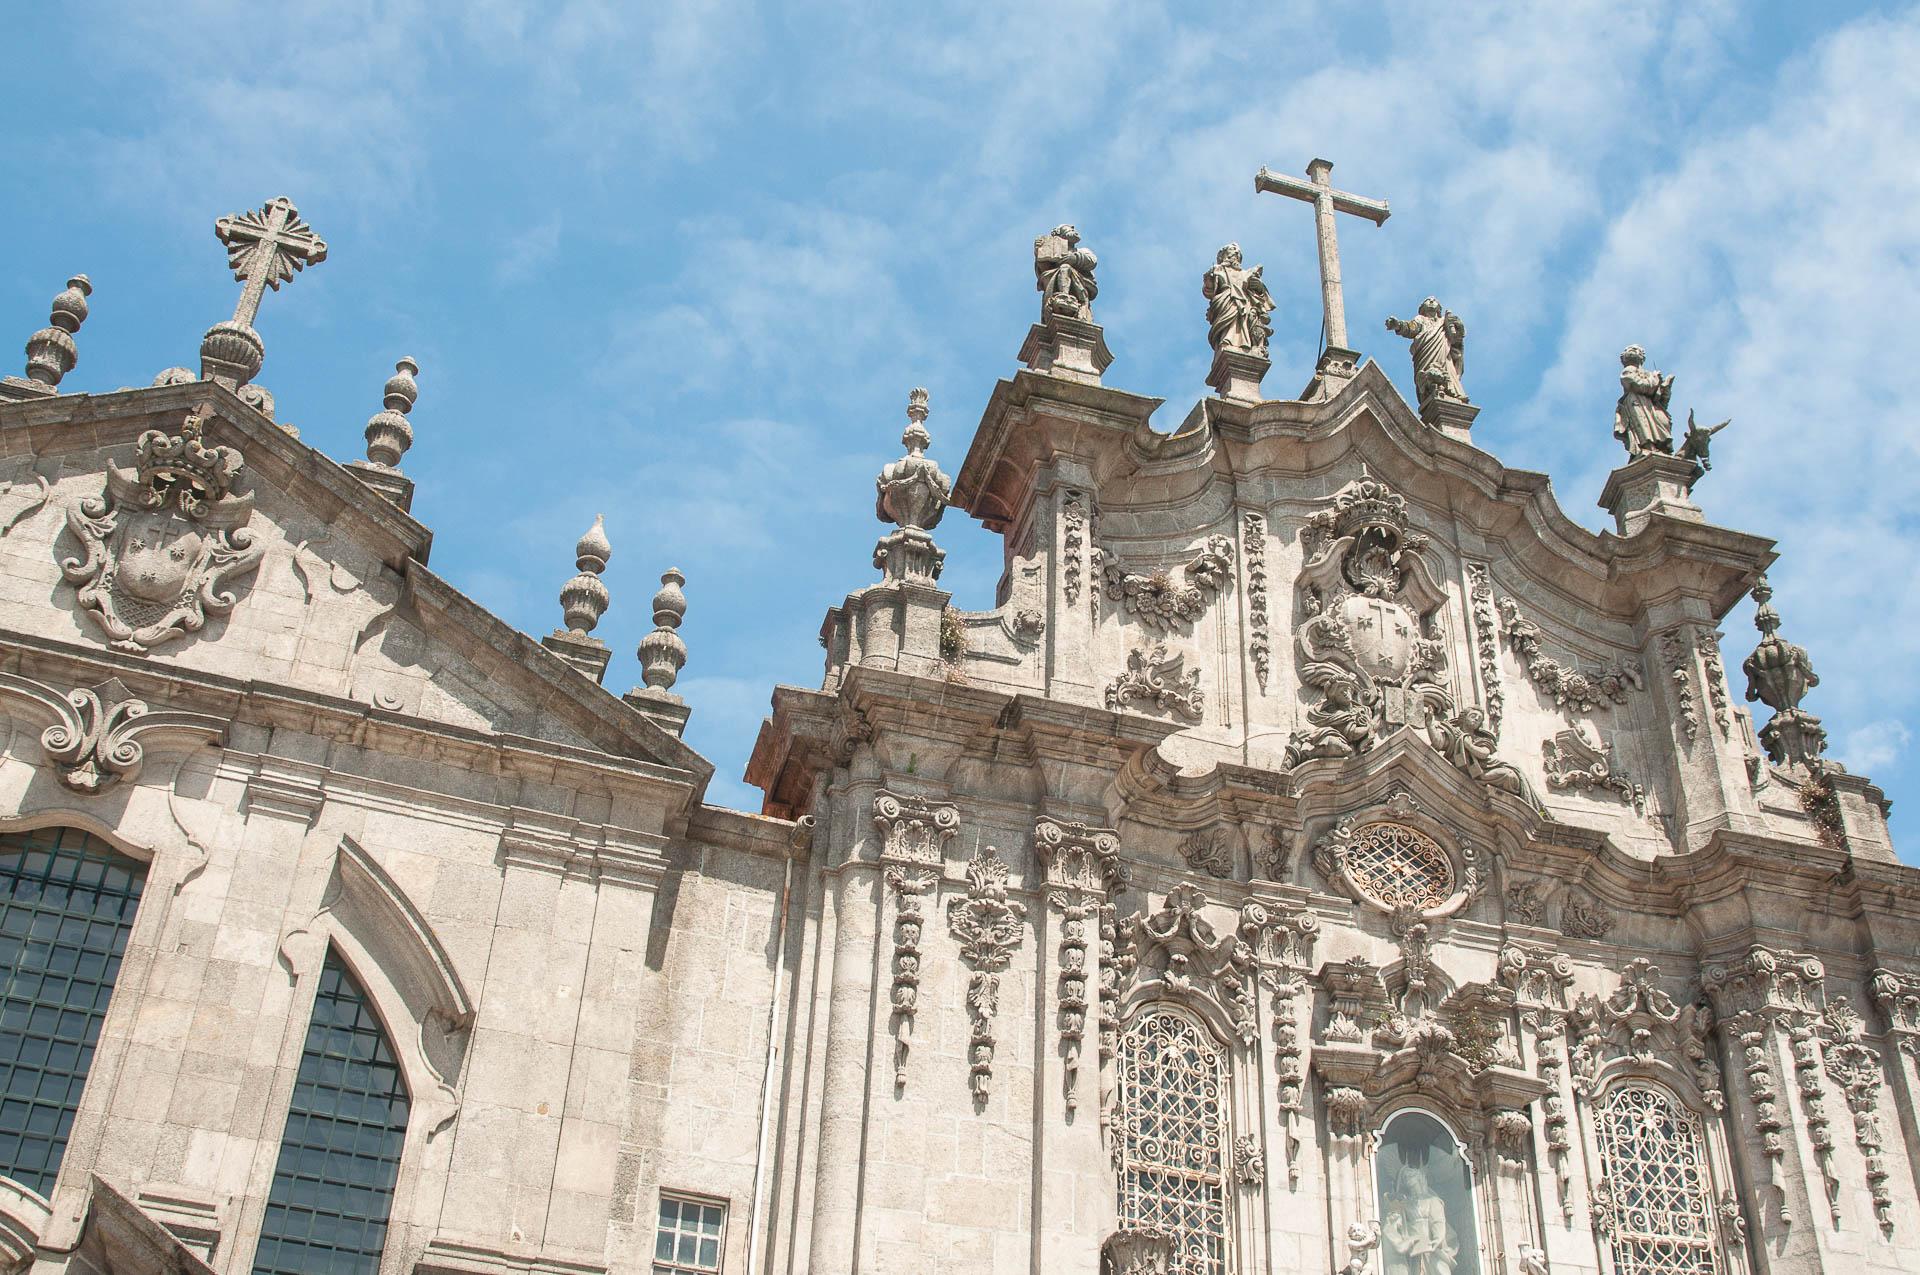 Porto façade église - Les globe blogueurs - blog voyage nature